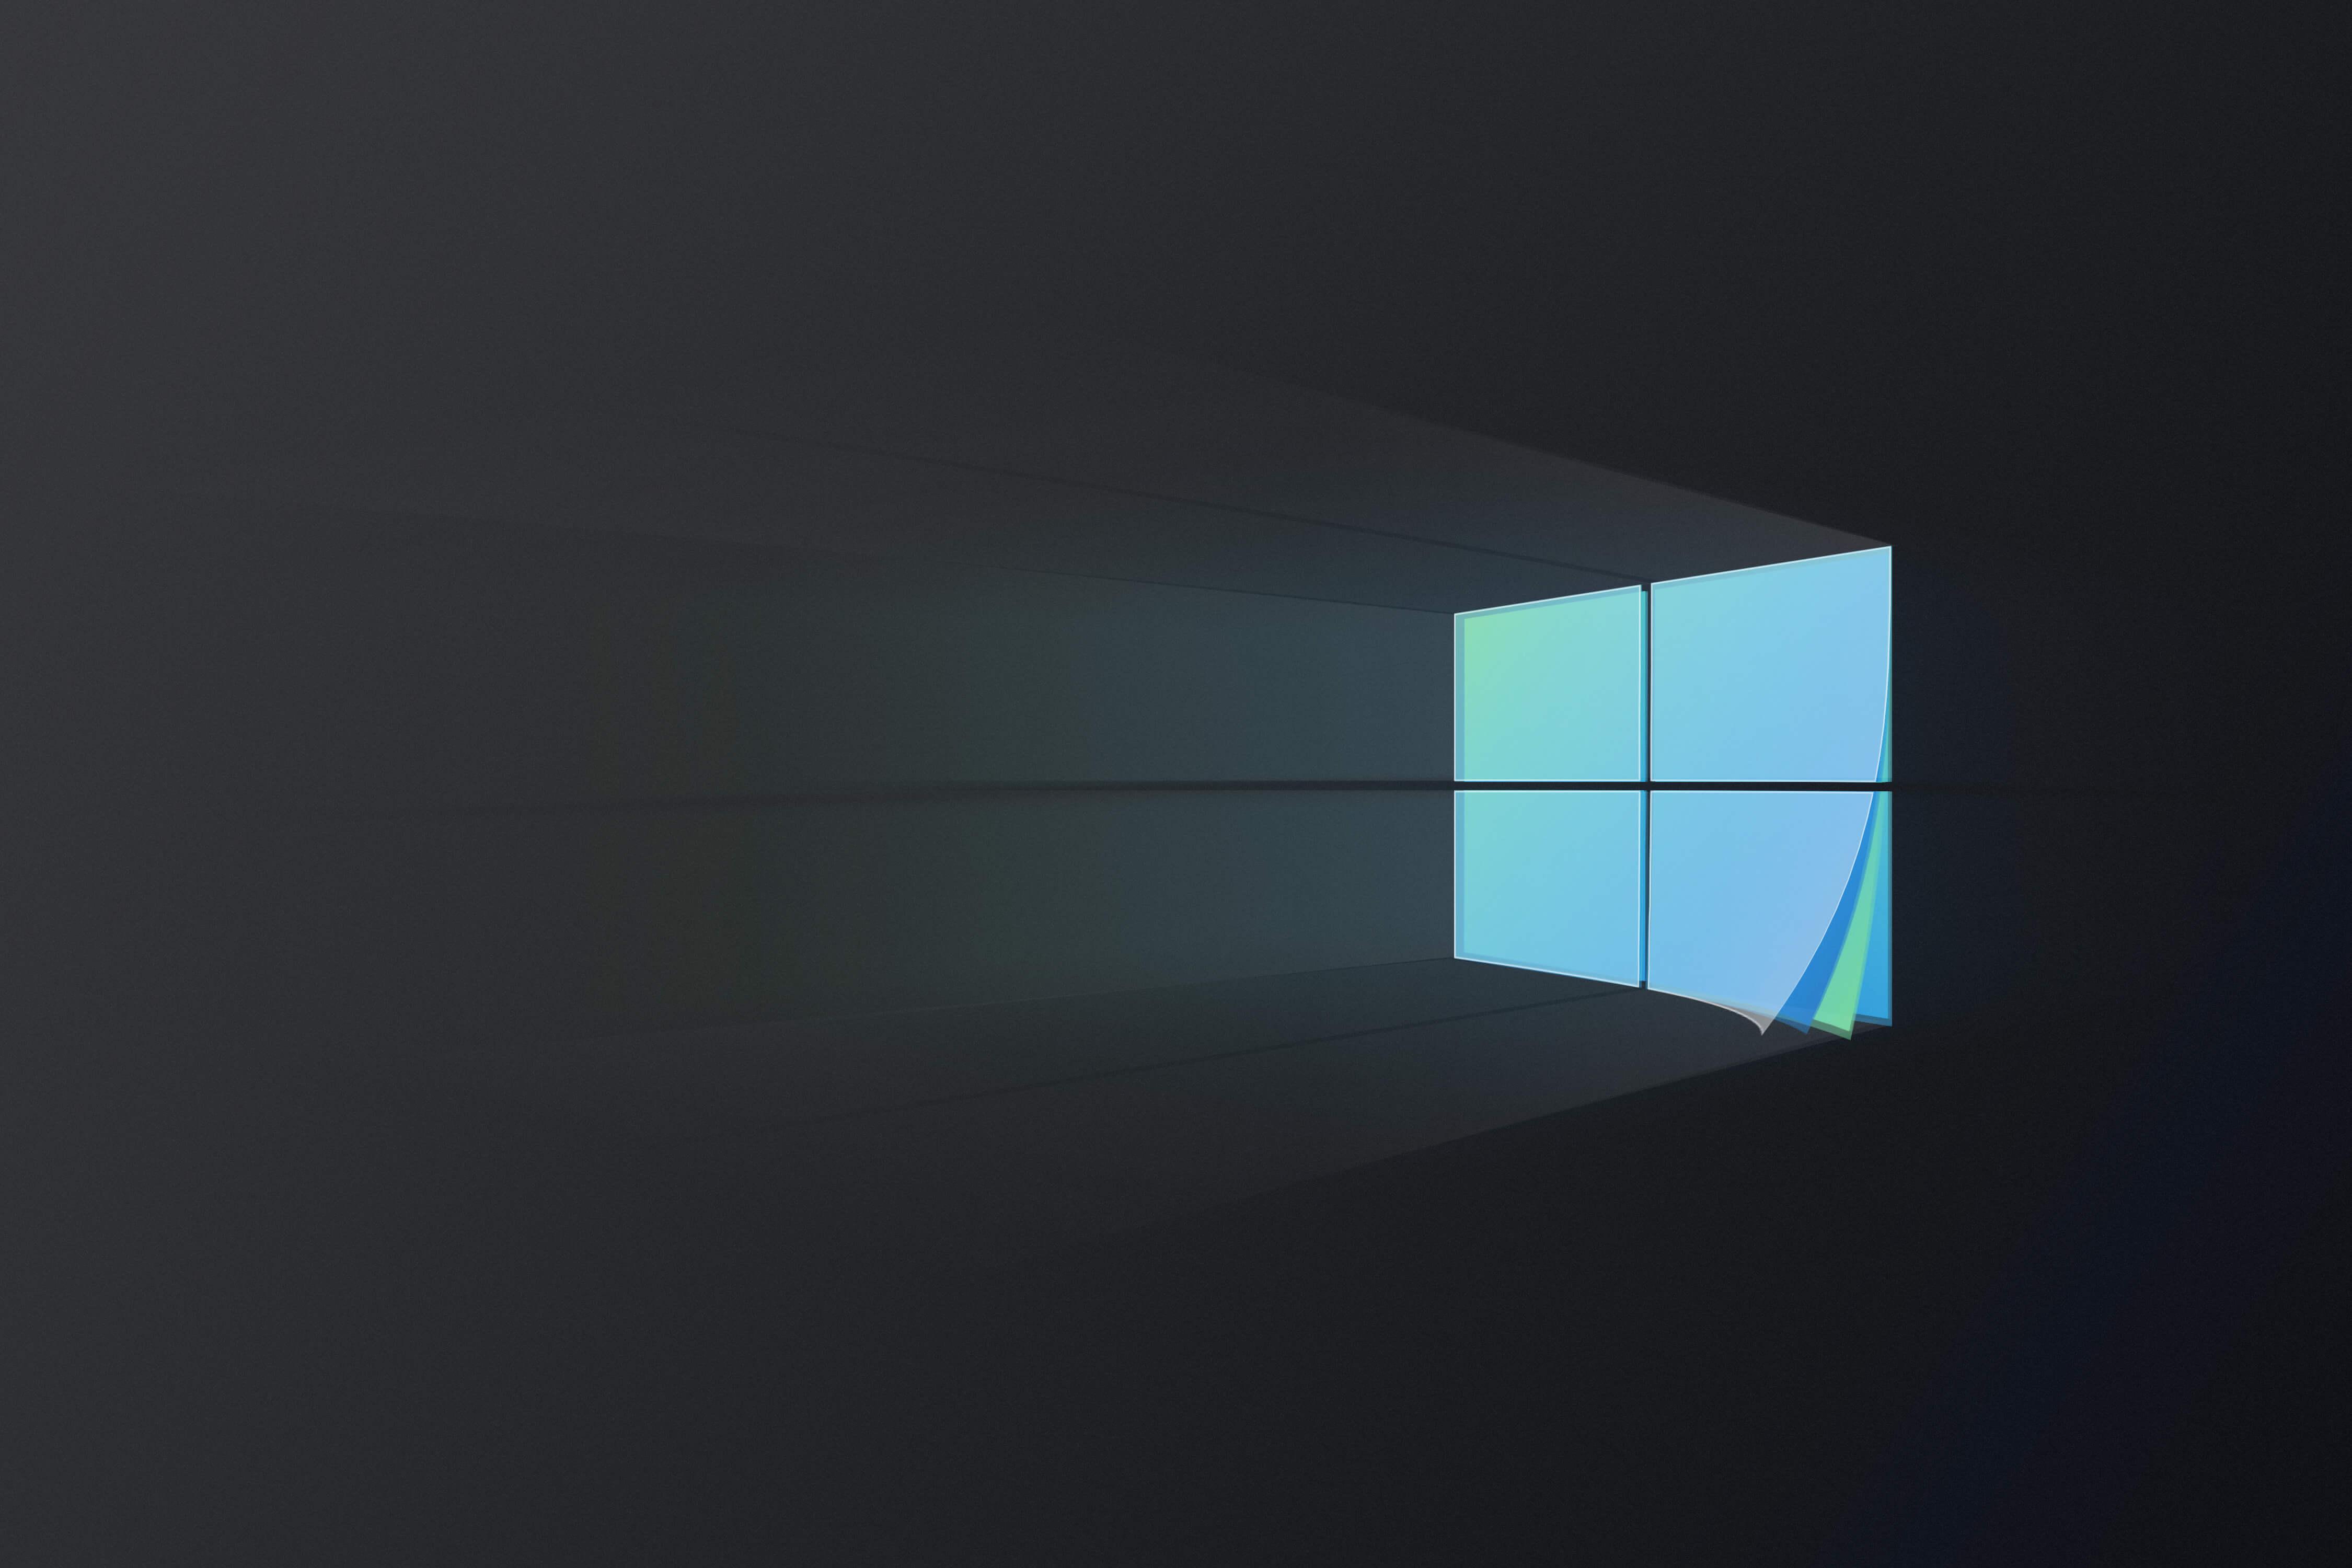 Wallpaper Windows 10 Microsoft 4500x3000 Thorragnarok